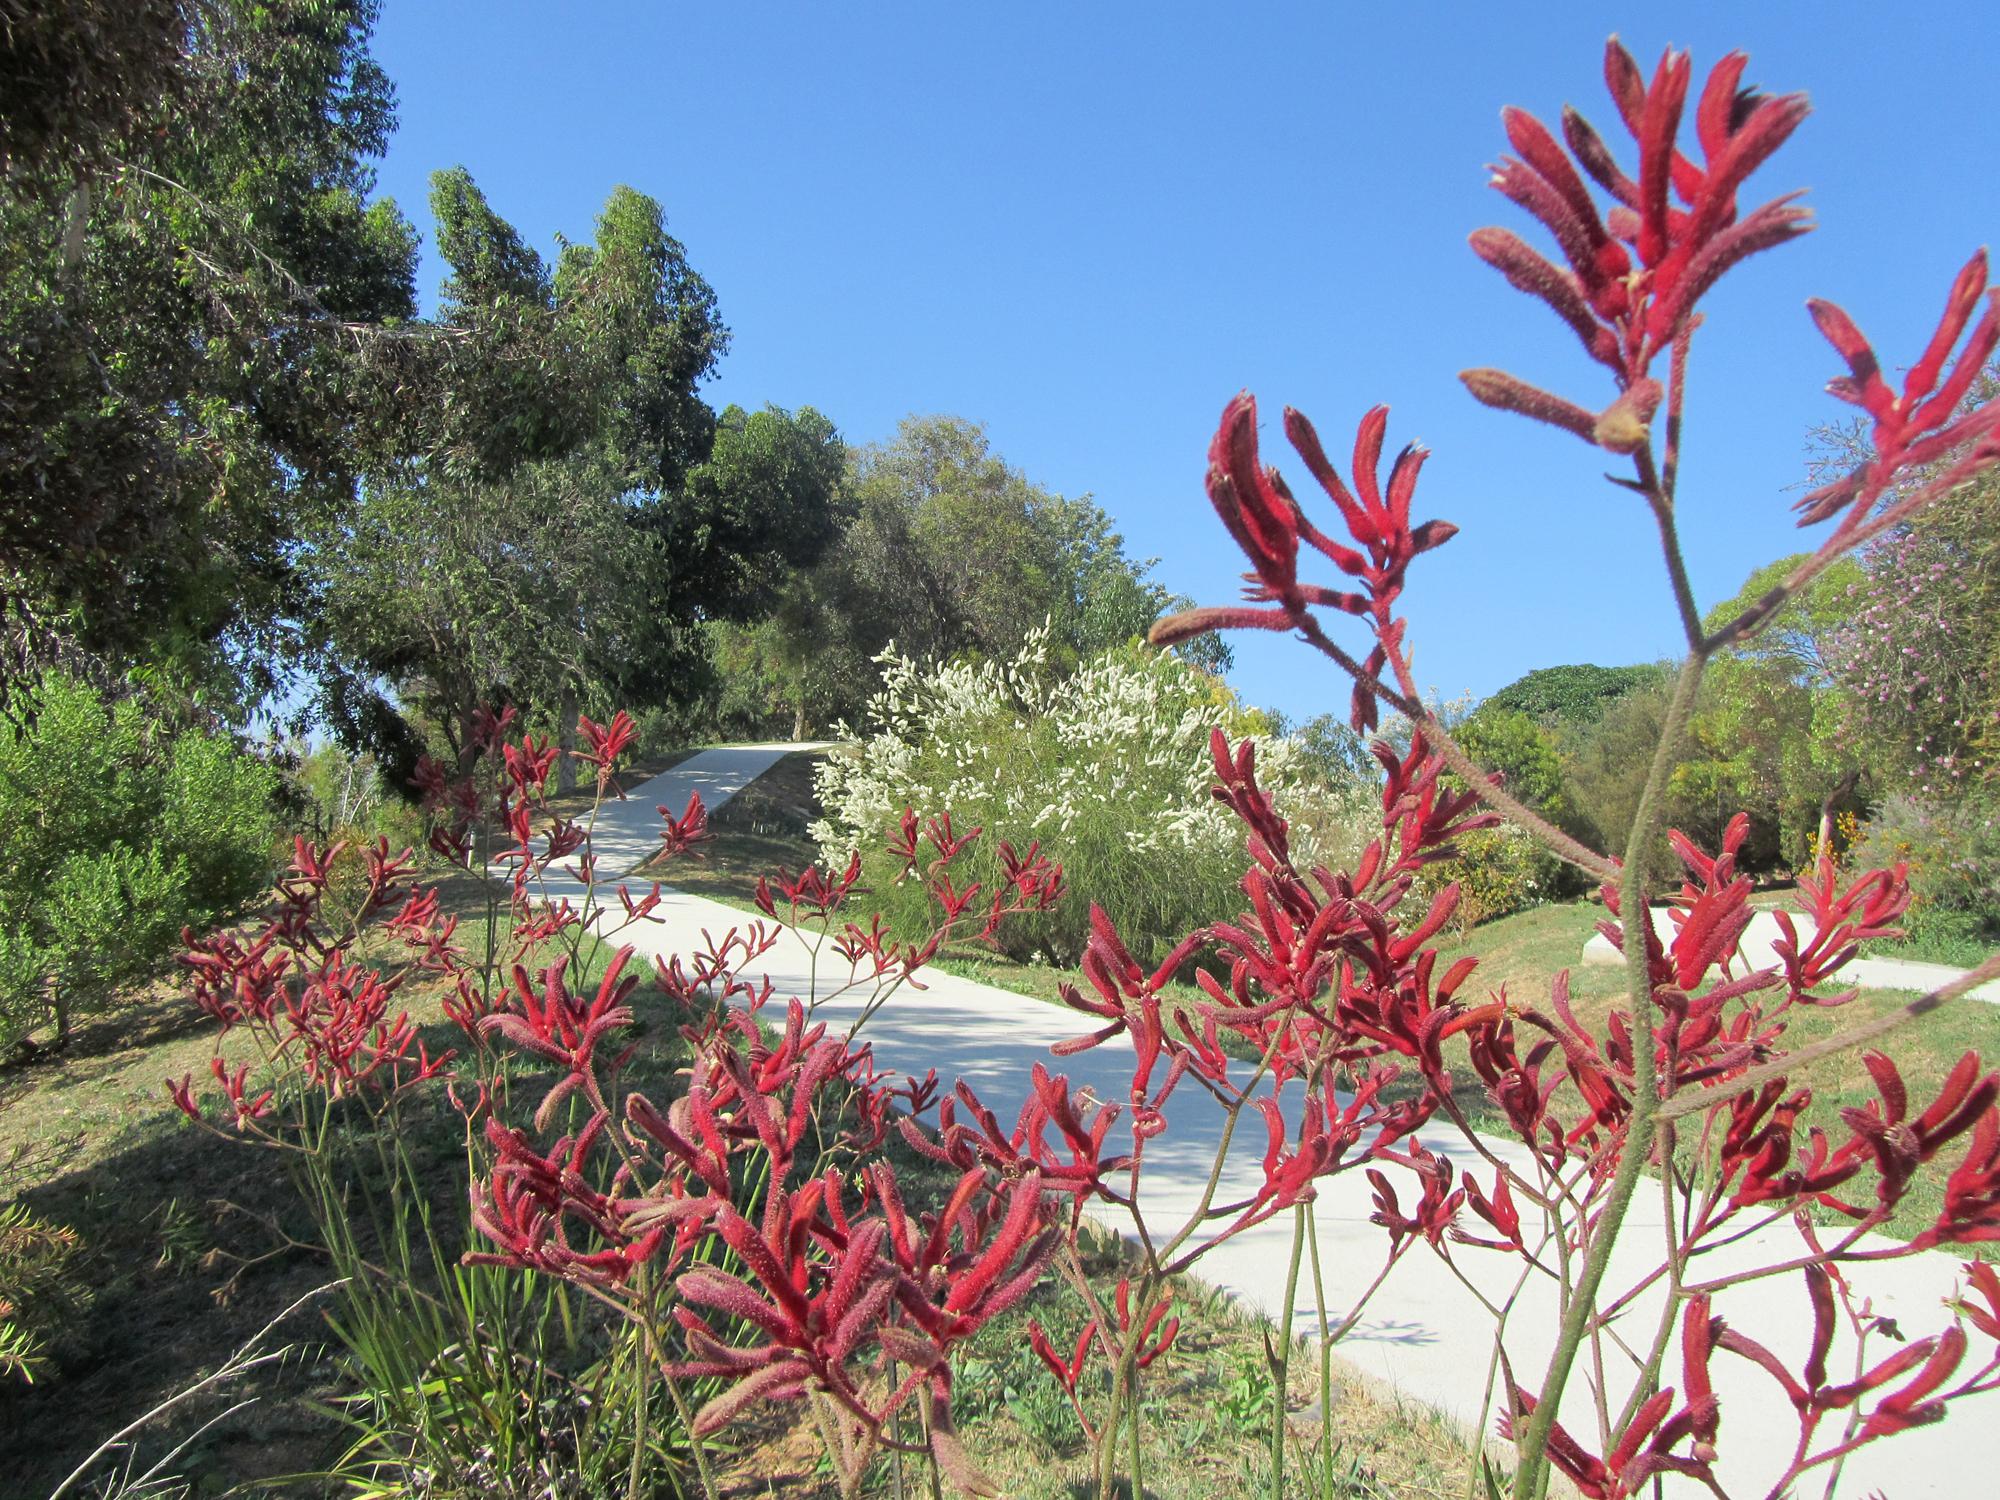 File jardi botanic de wikimedia commons for Botanic com jardin